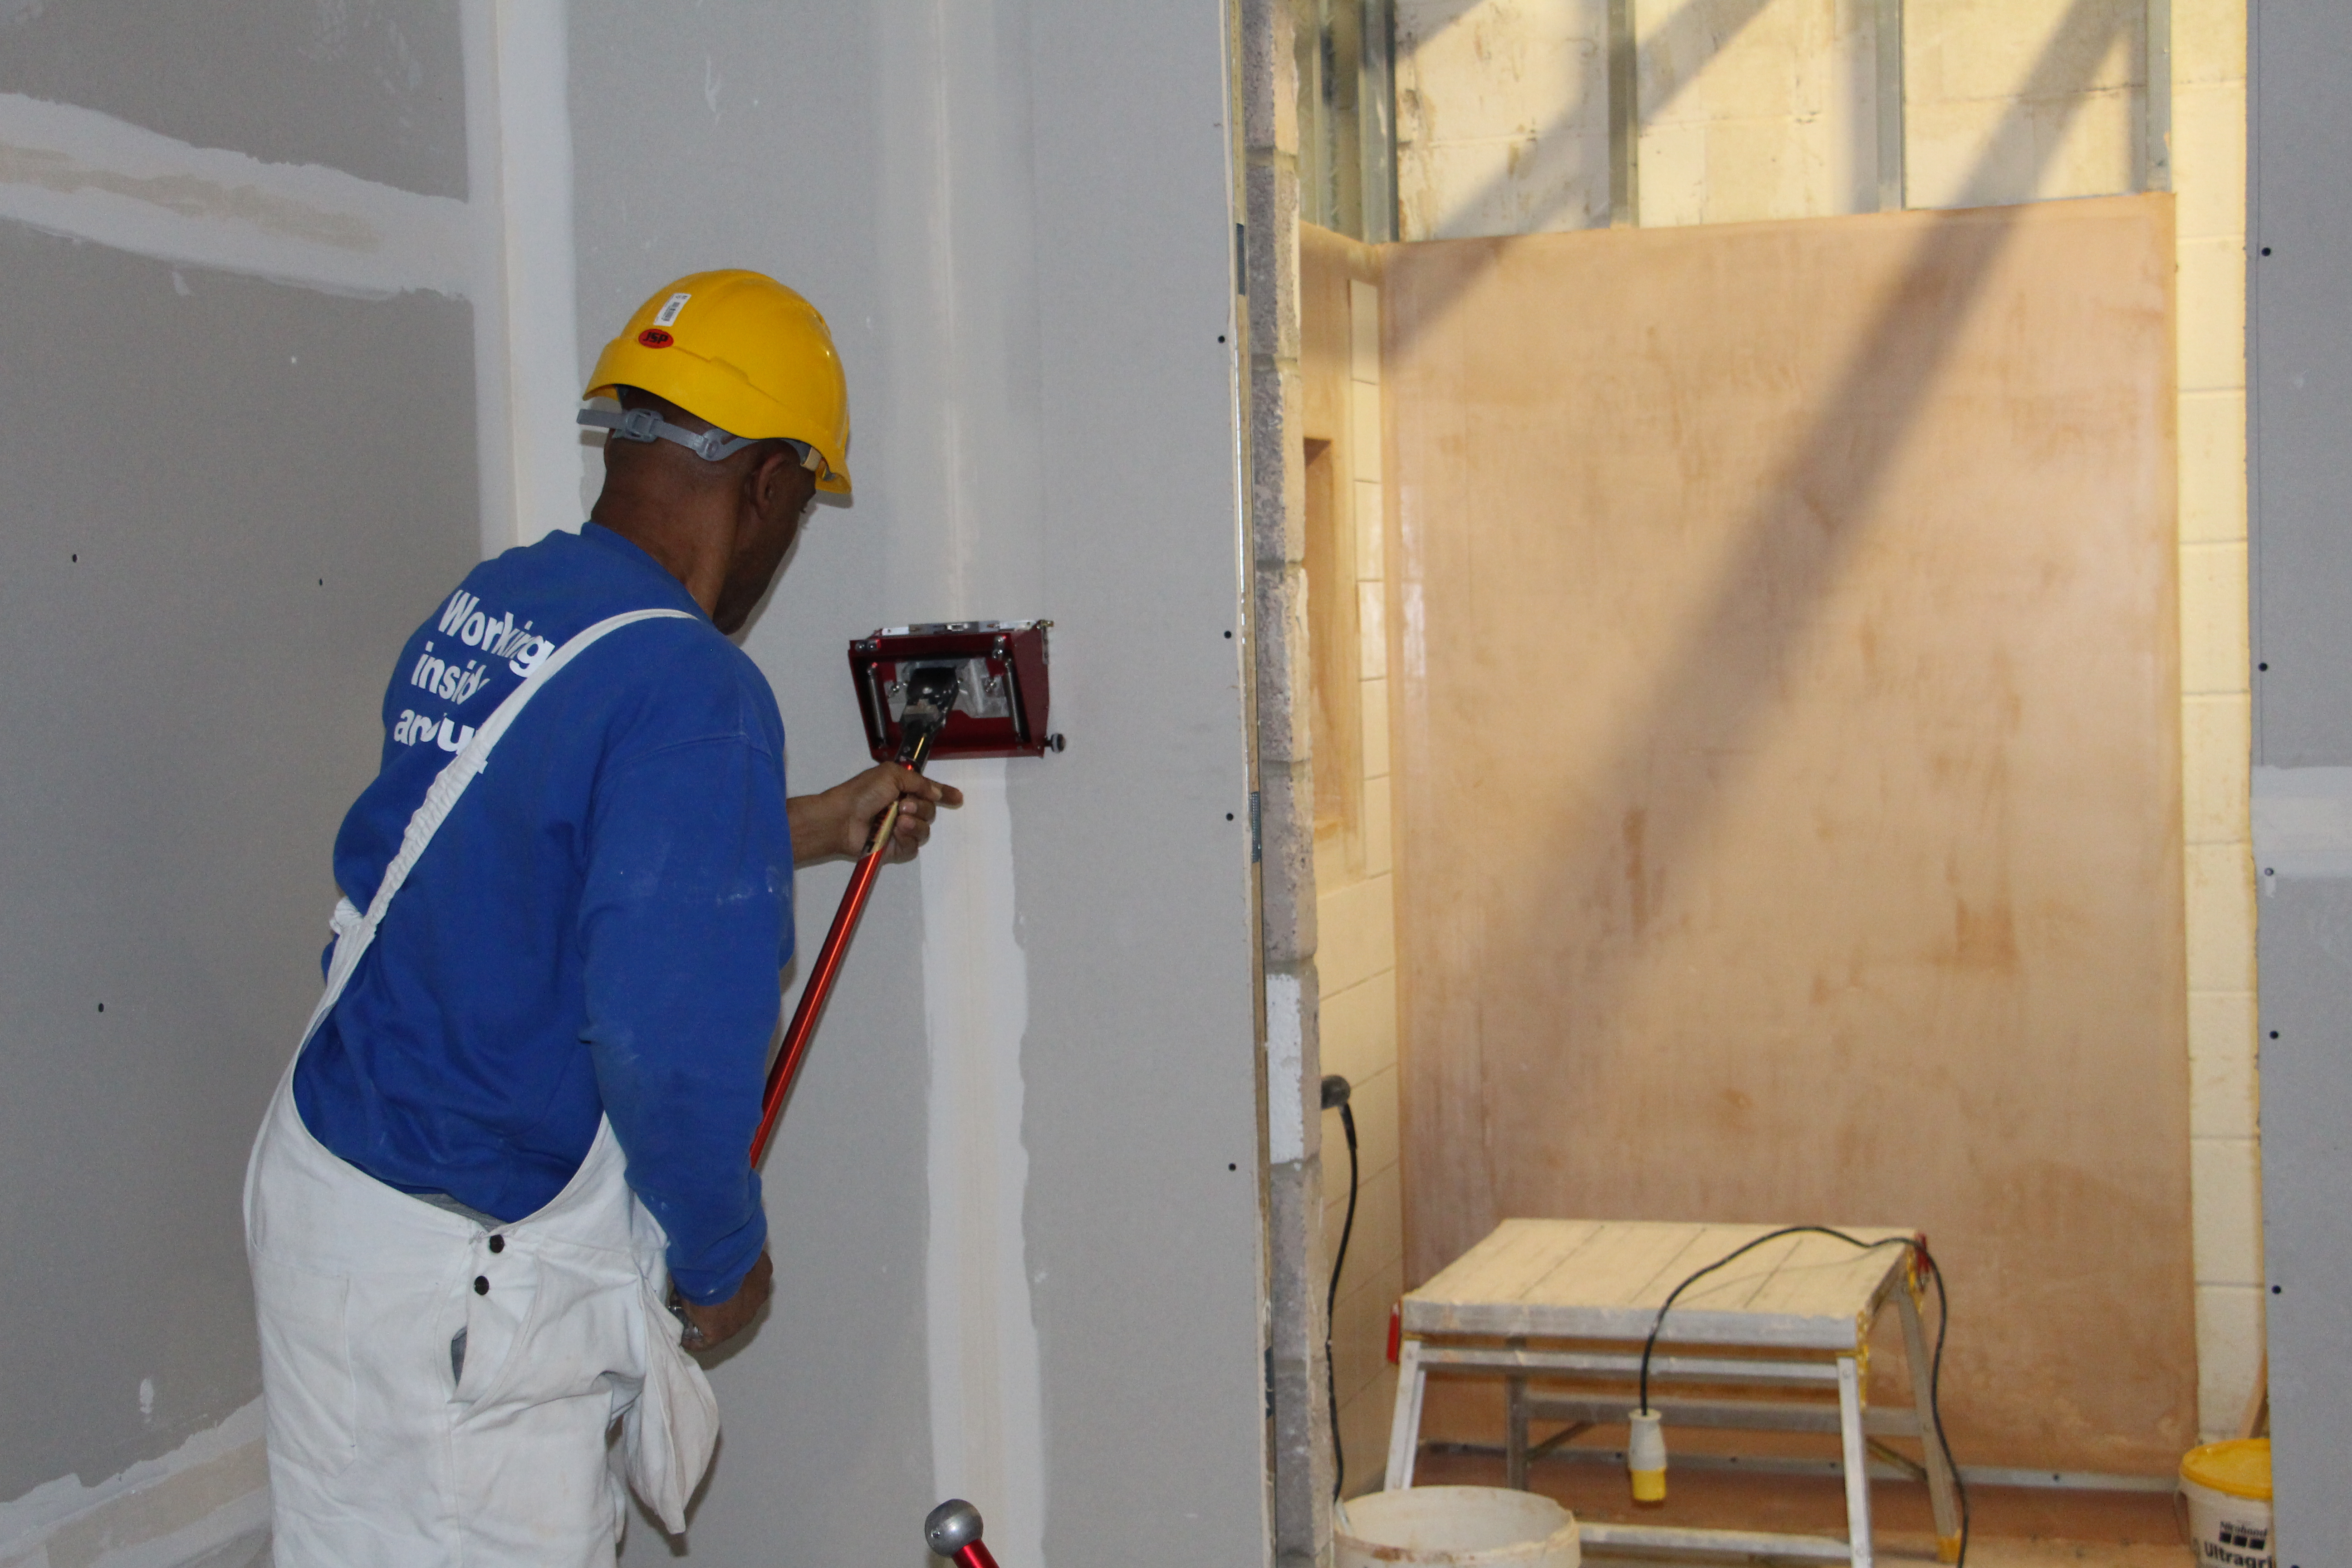 Using a drywall flat box